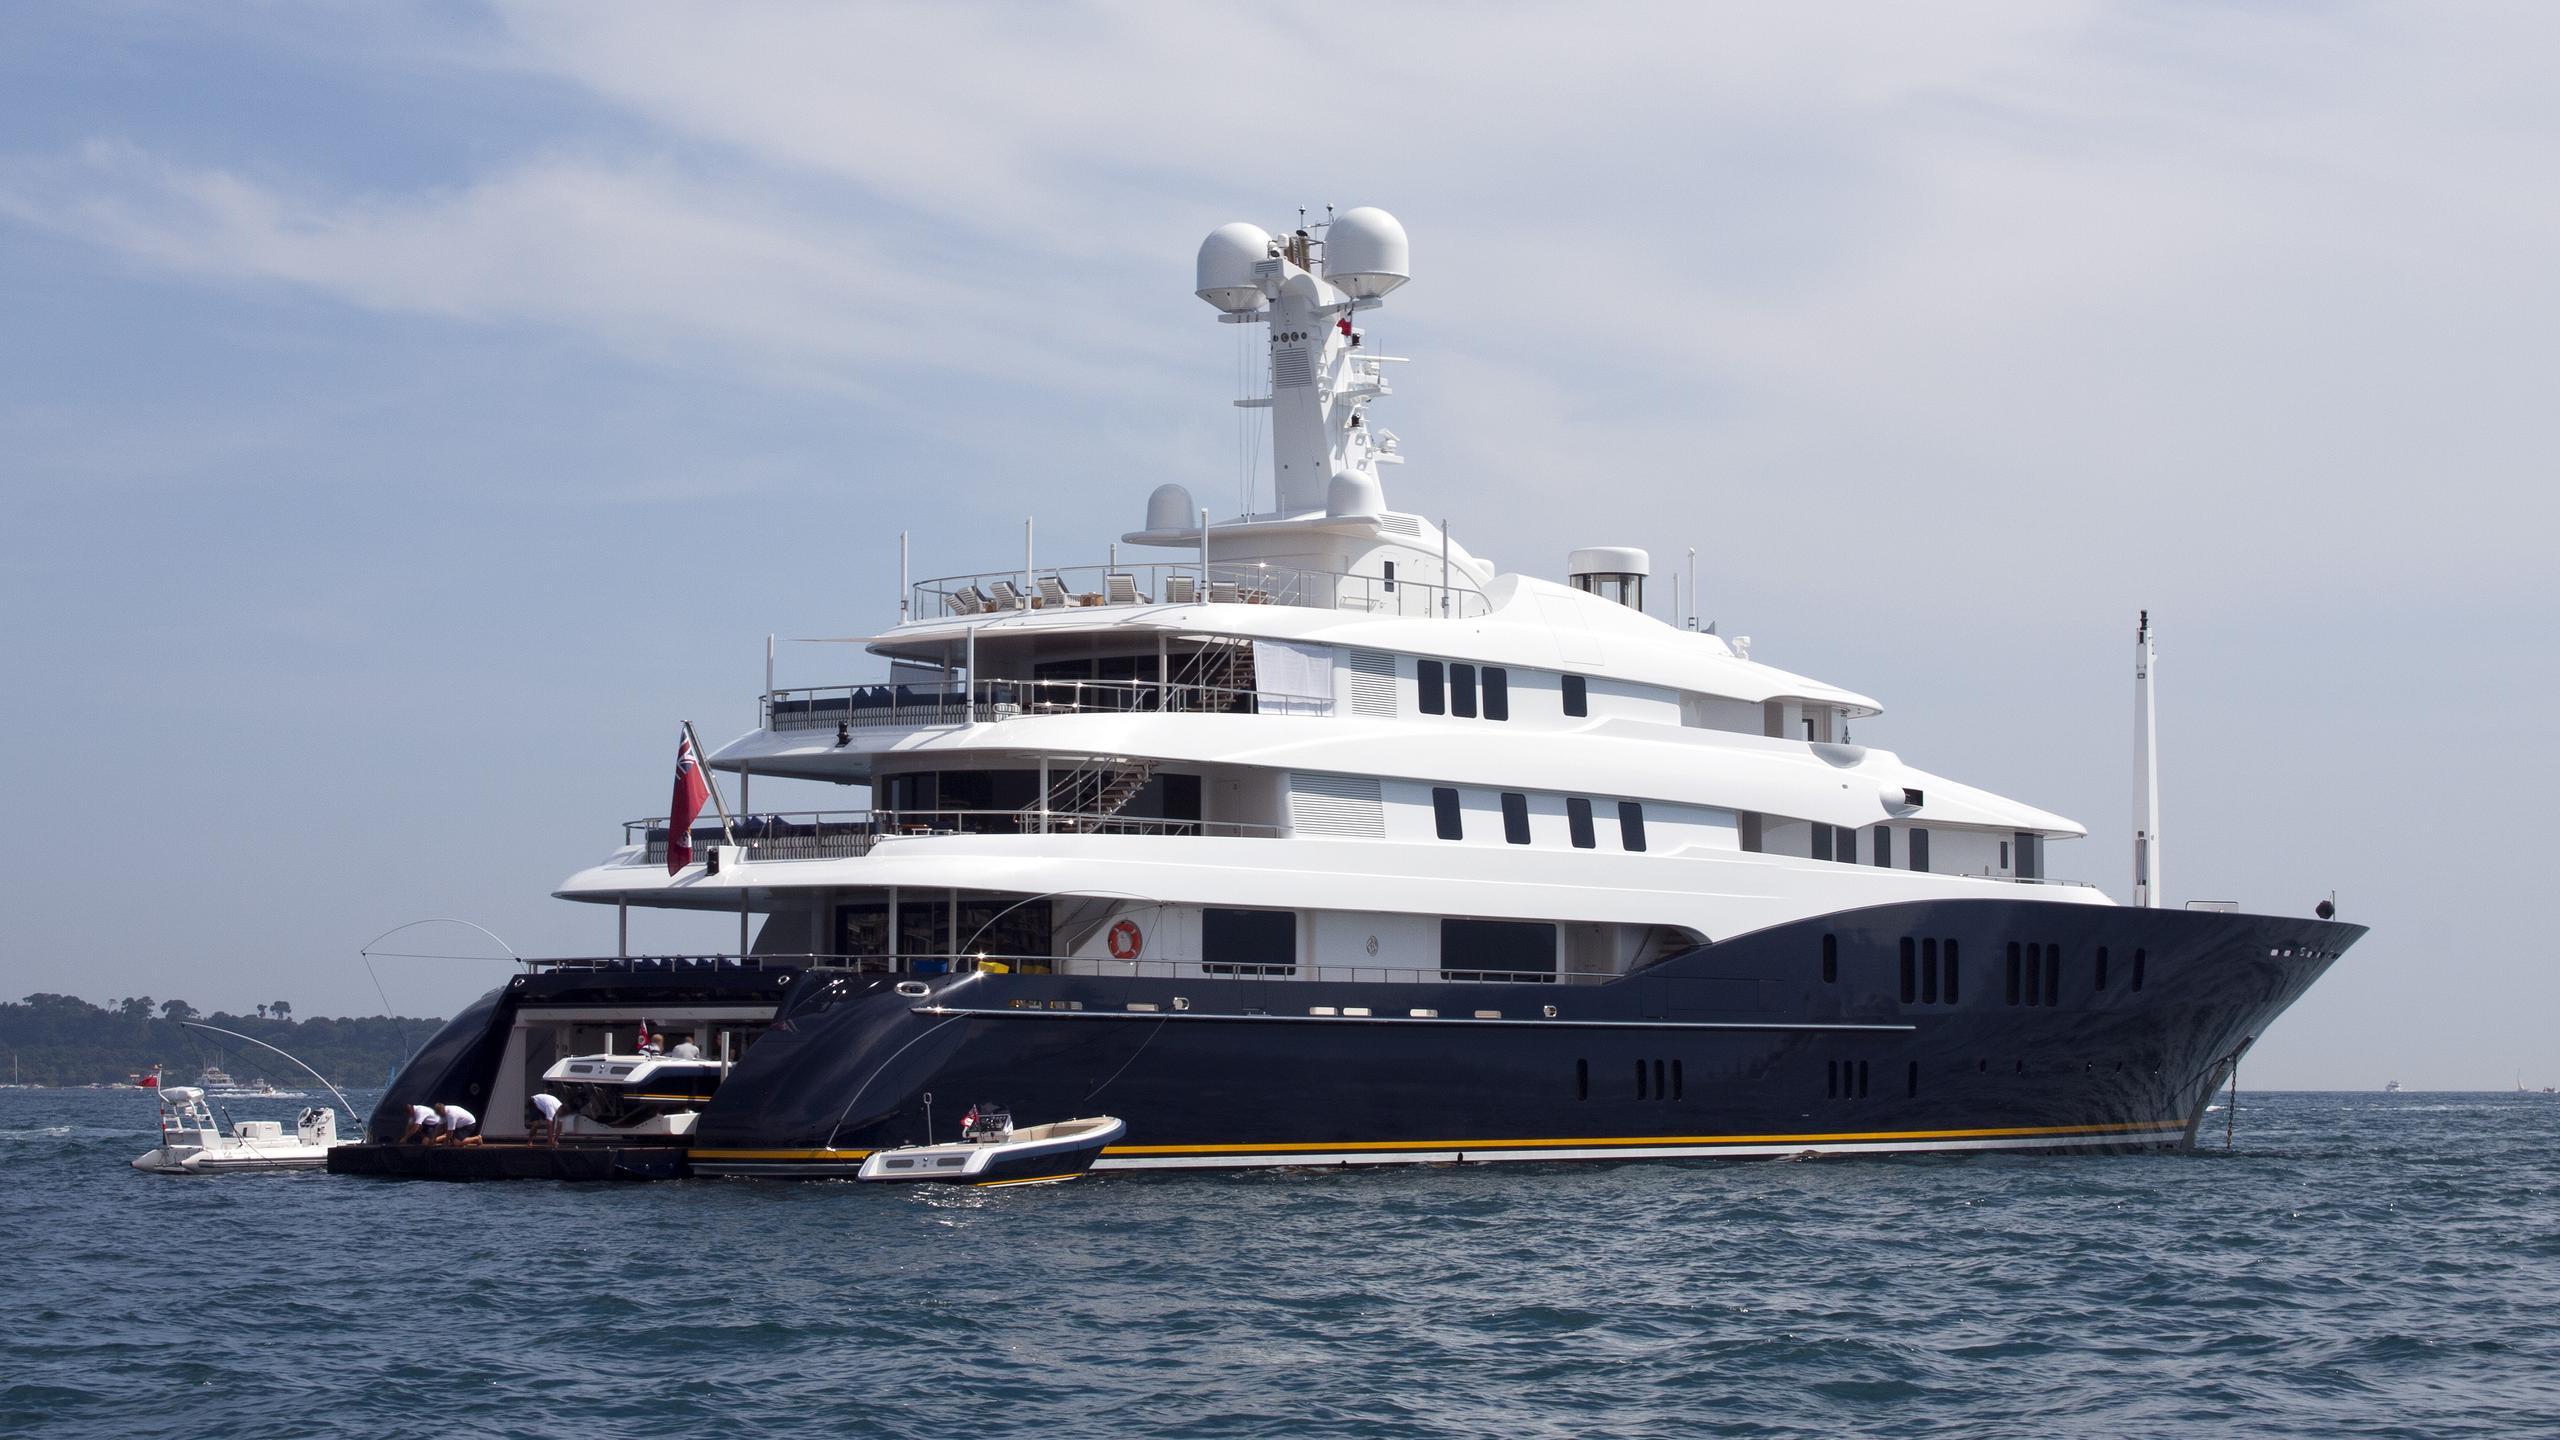 c2-motor-yacht-half-profile-abeking-rasmussen-2008-78m-half-profile-back